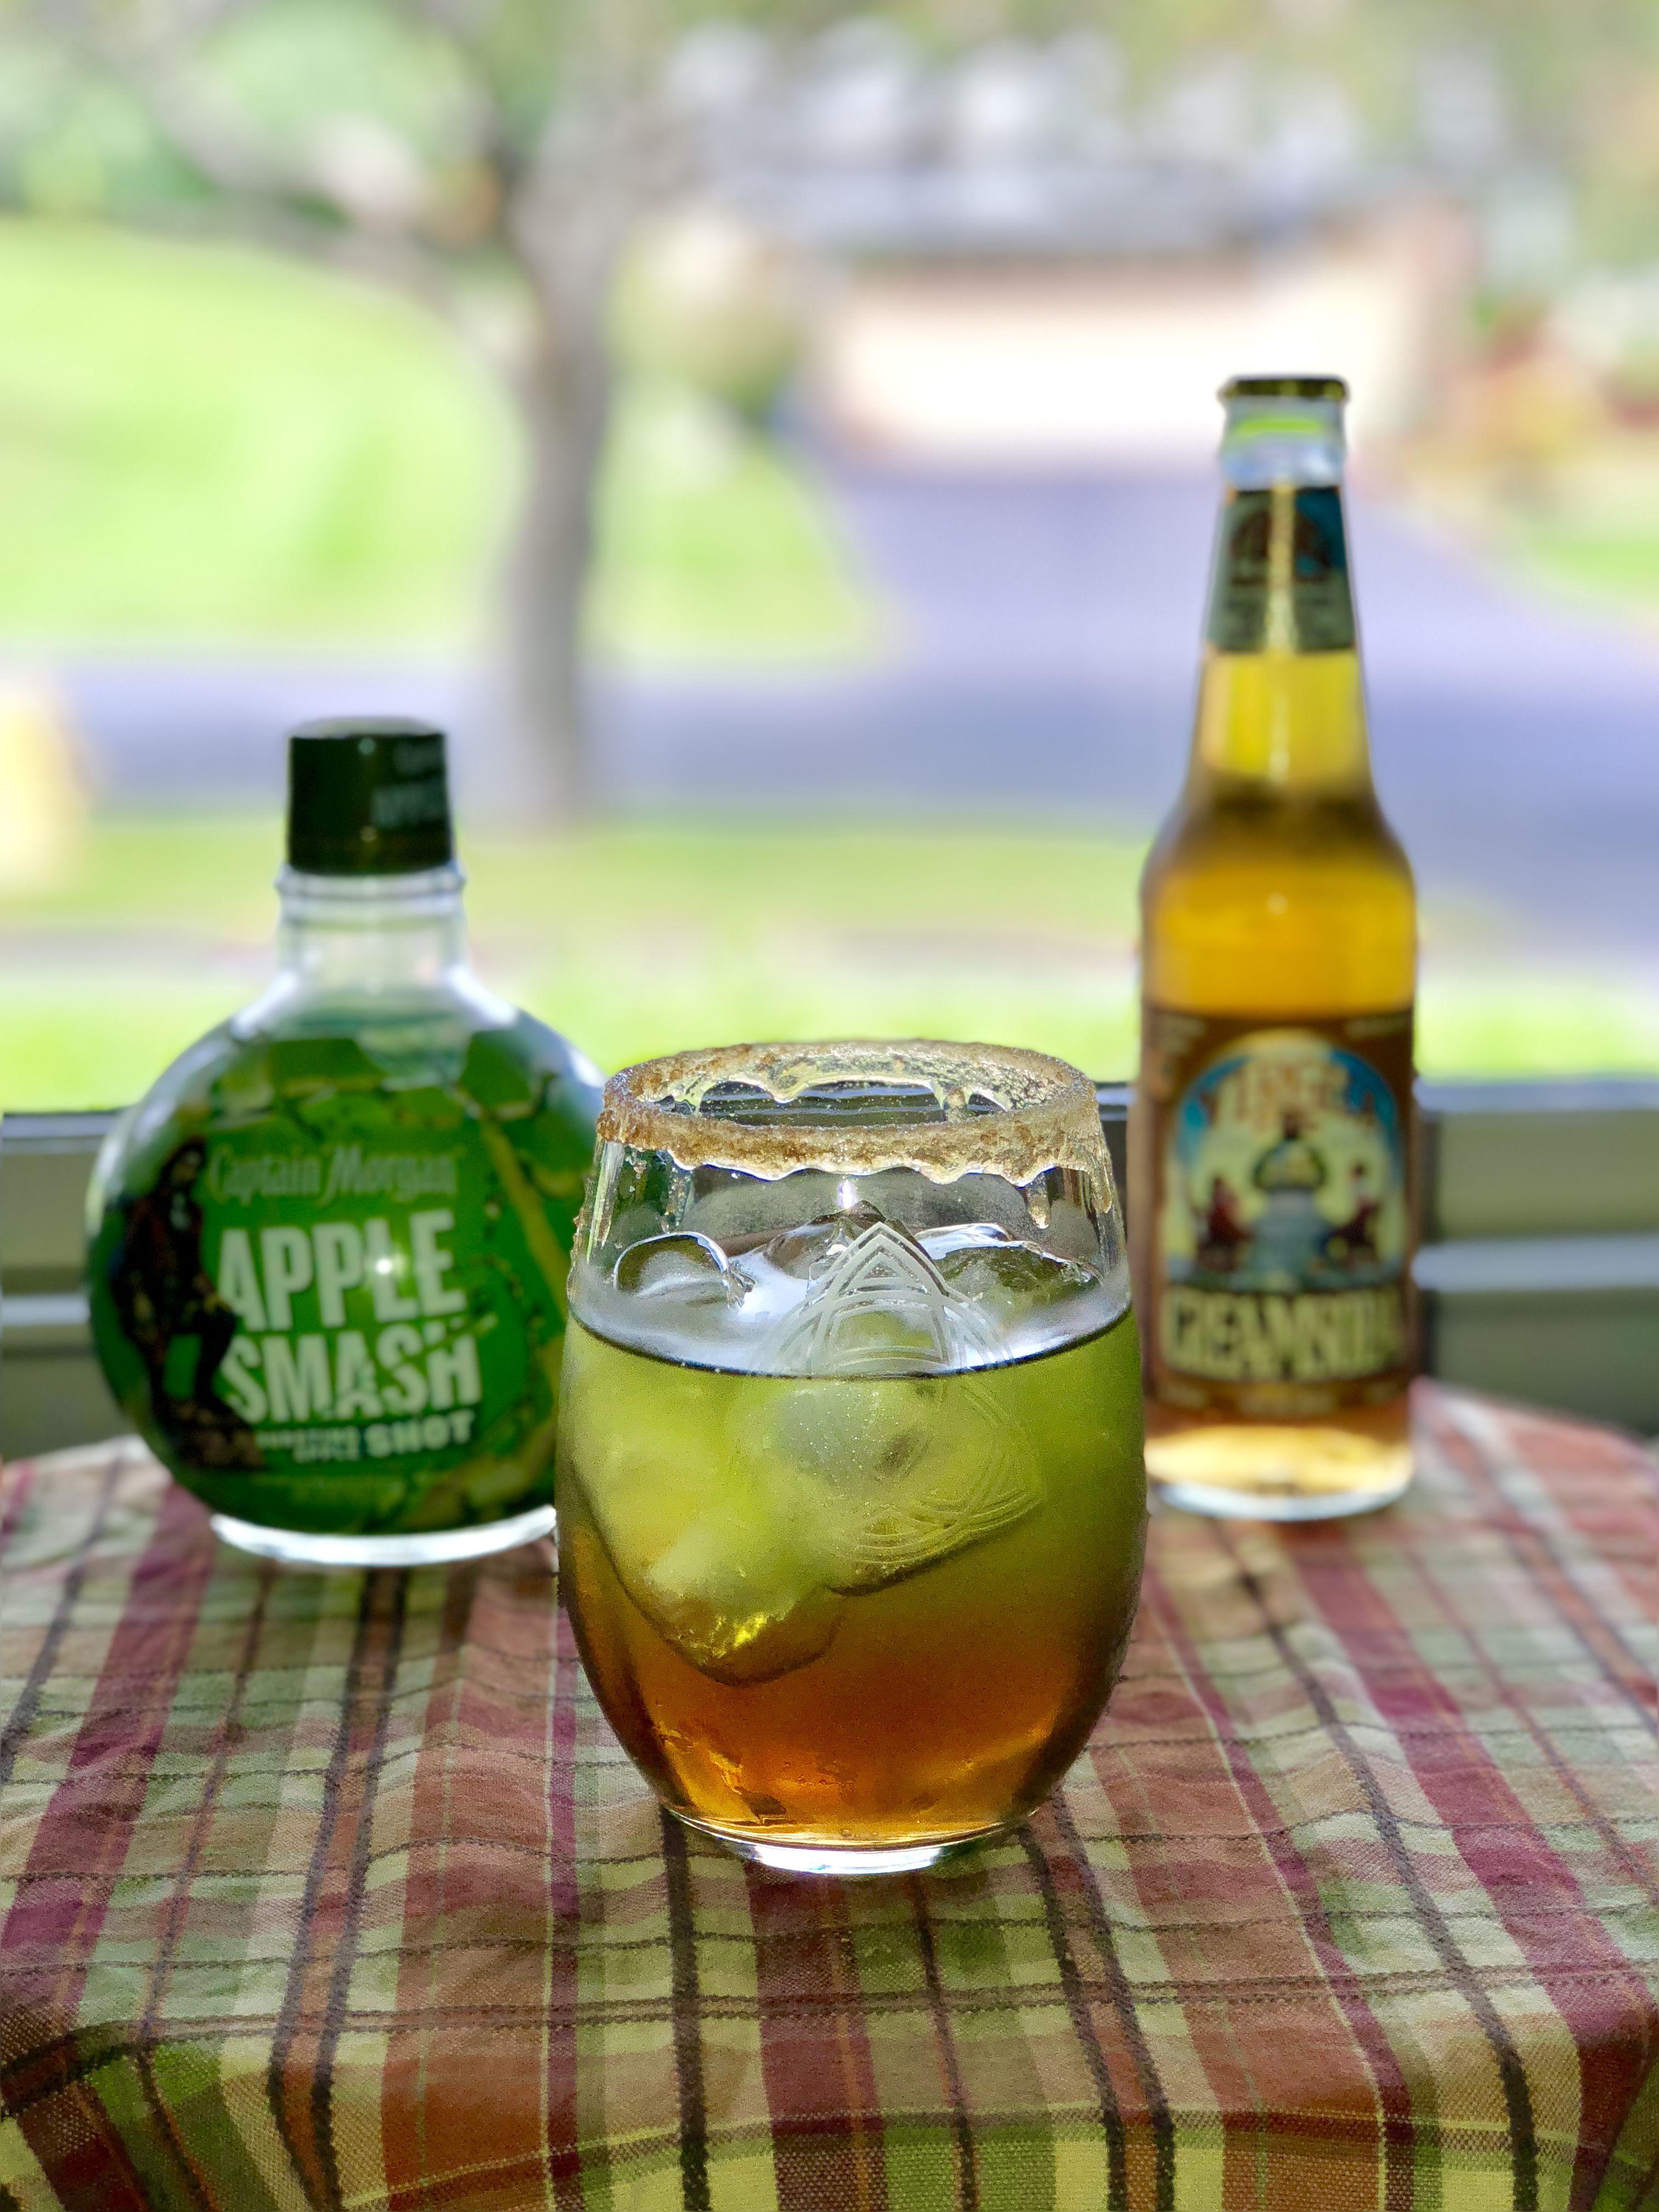 Carmel Apple Smash 1 2oz Captain Morgan Apple Smash Rum 4oz Cream Soda Rim Glass With Caramel And Brown Sugar Or Ca Cream Soda Captain Morgan Liquor Drinks